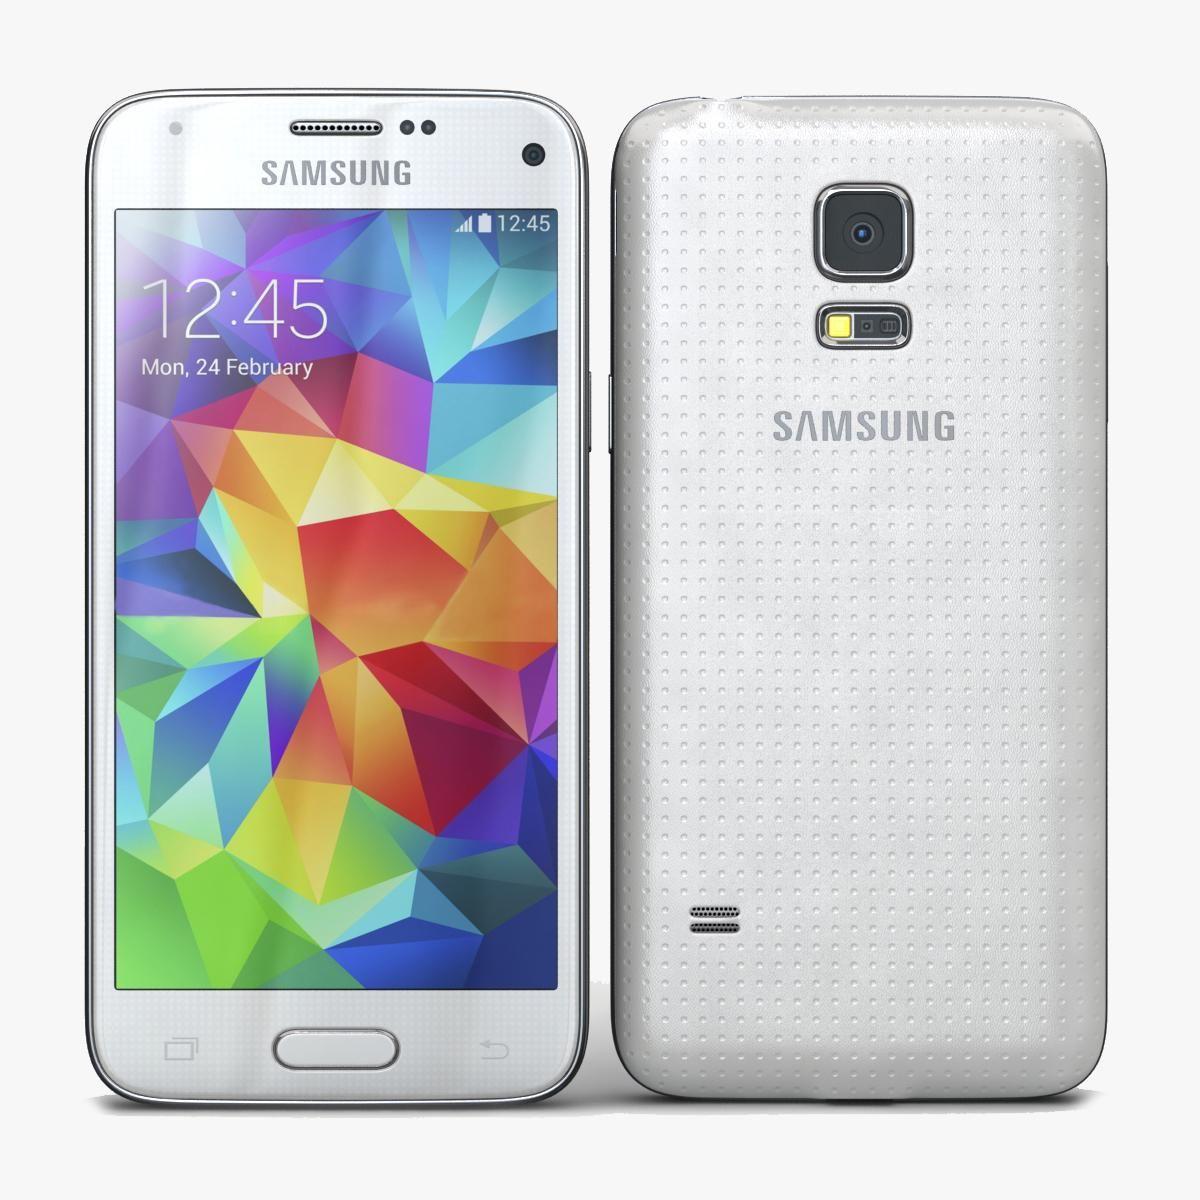 Samsung Galaxy S5 Mini Shimmery White 3d Model Ad Galaxy Samsung Mini Model Samsung Galaxy S5 Galaxy S5 Samsung Galaxy